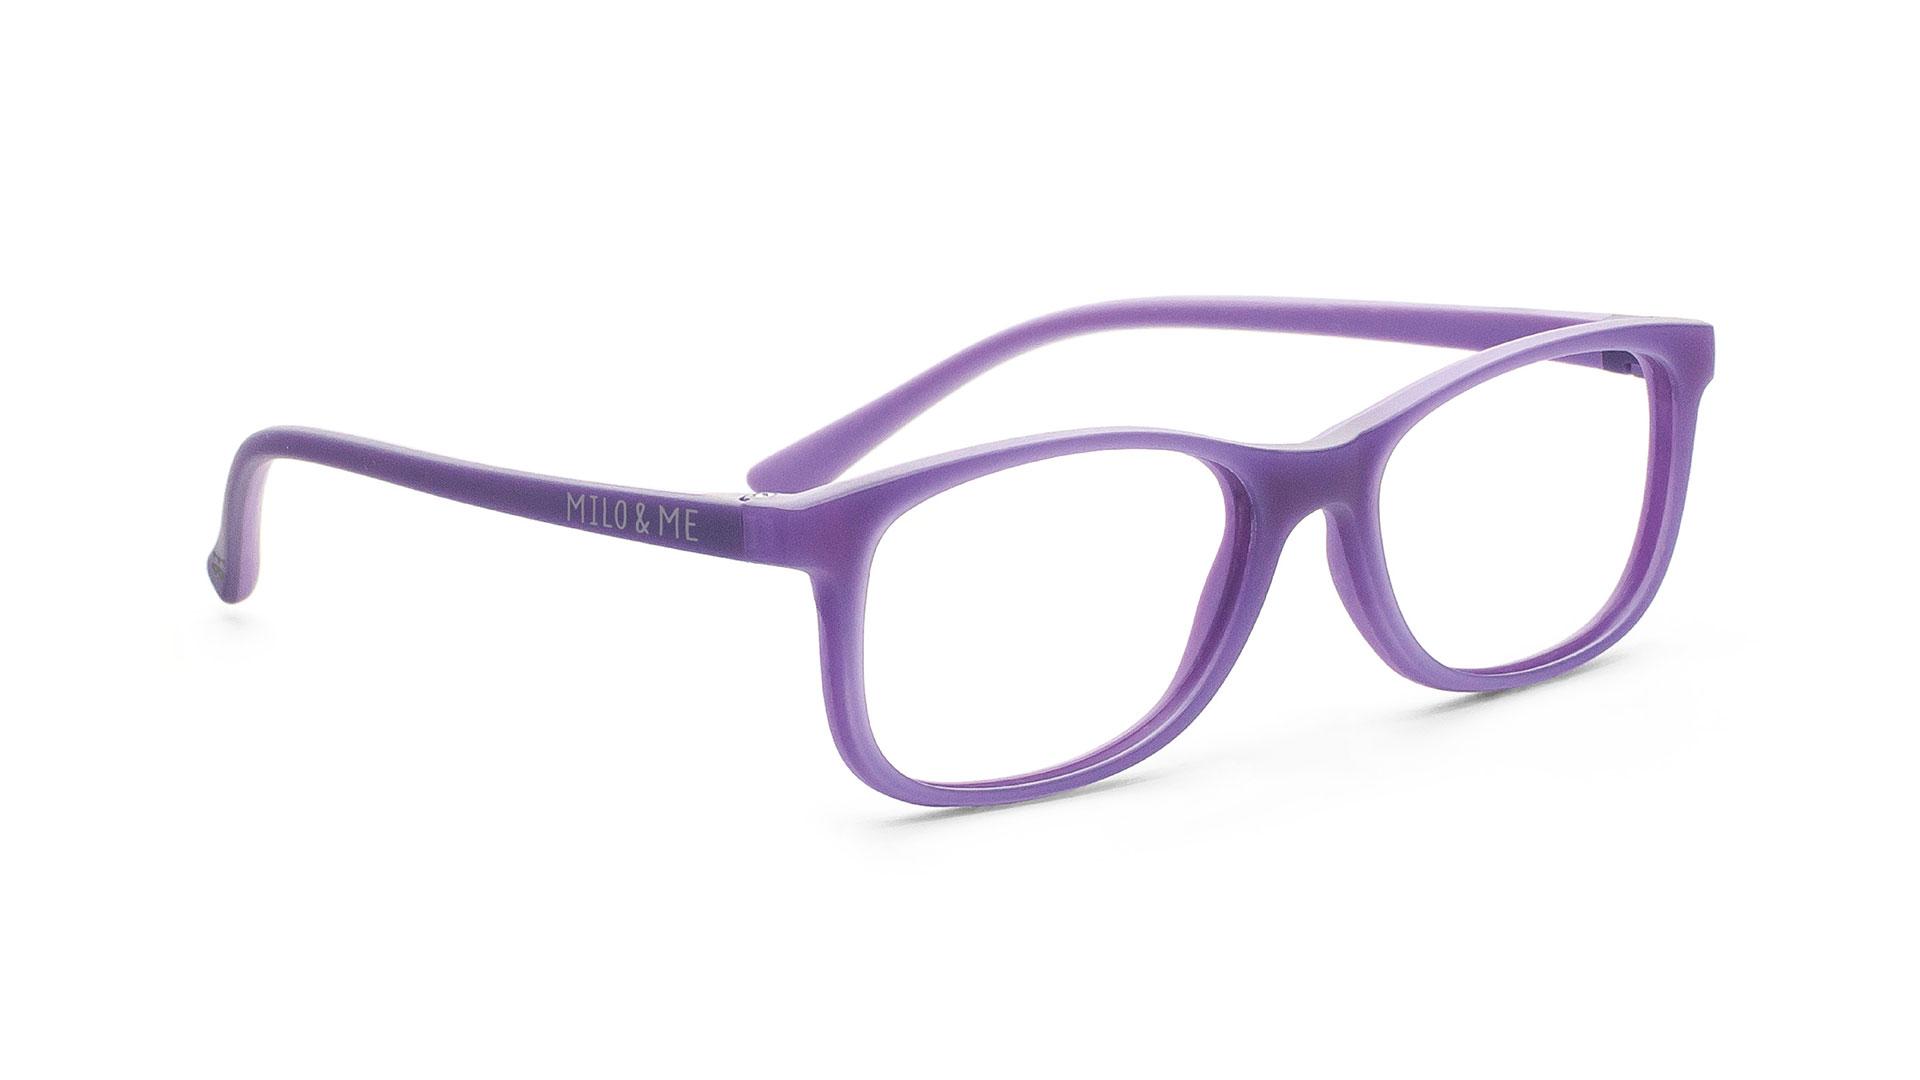 Dark Lilac Light Lilac H85040-07 - Milo & Me Eyewear - Optimum RX Lens Specialists